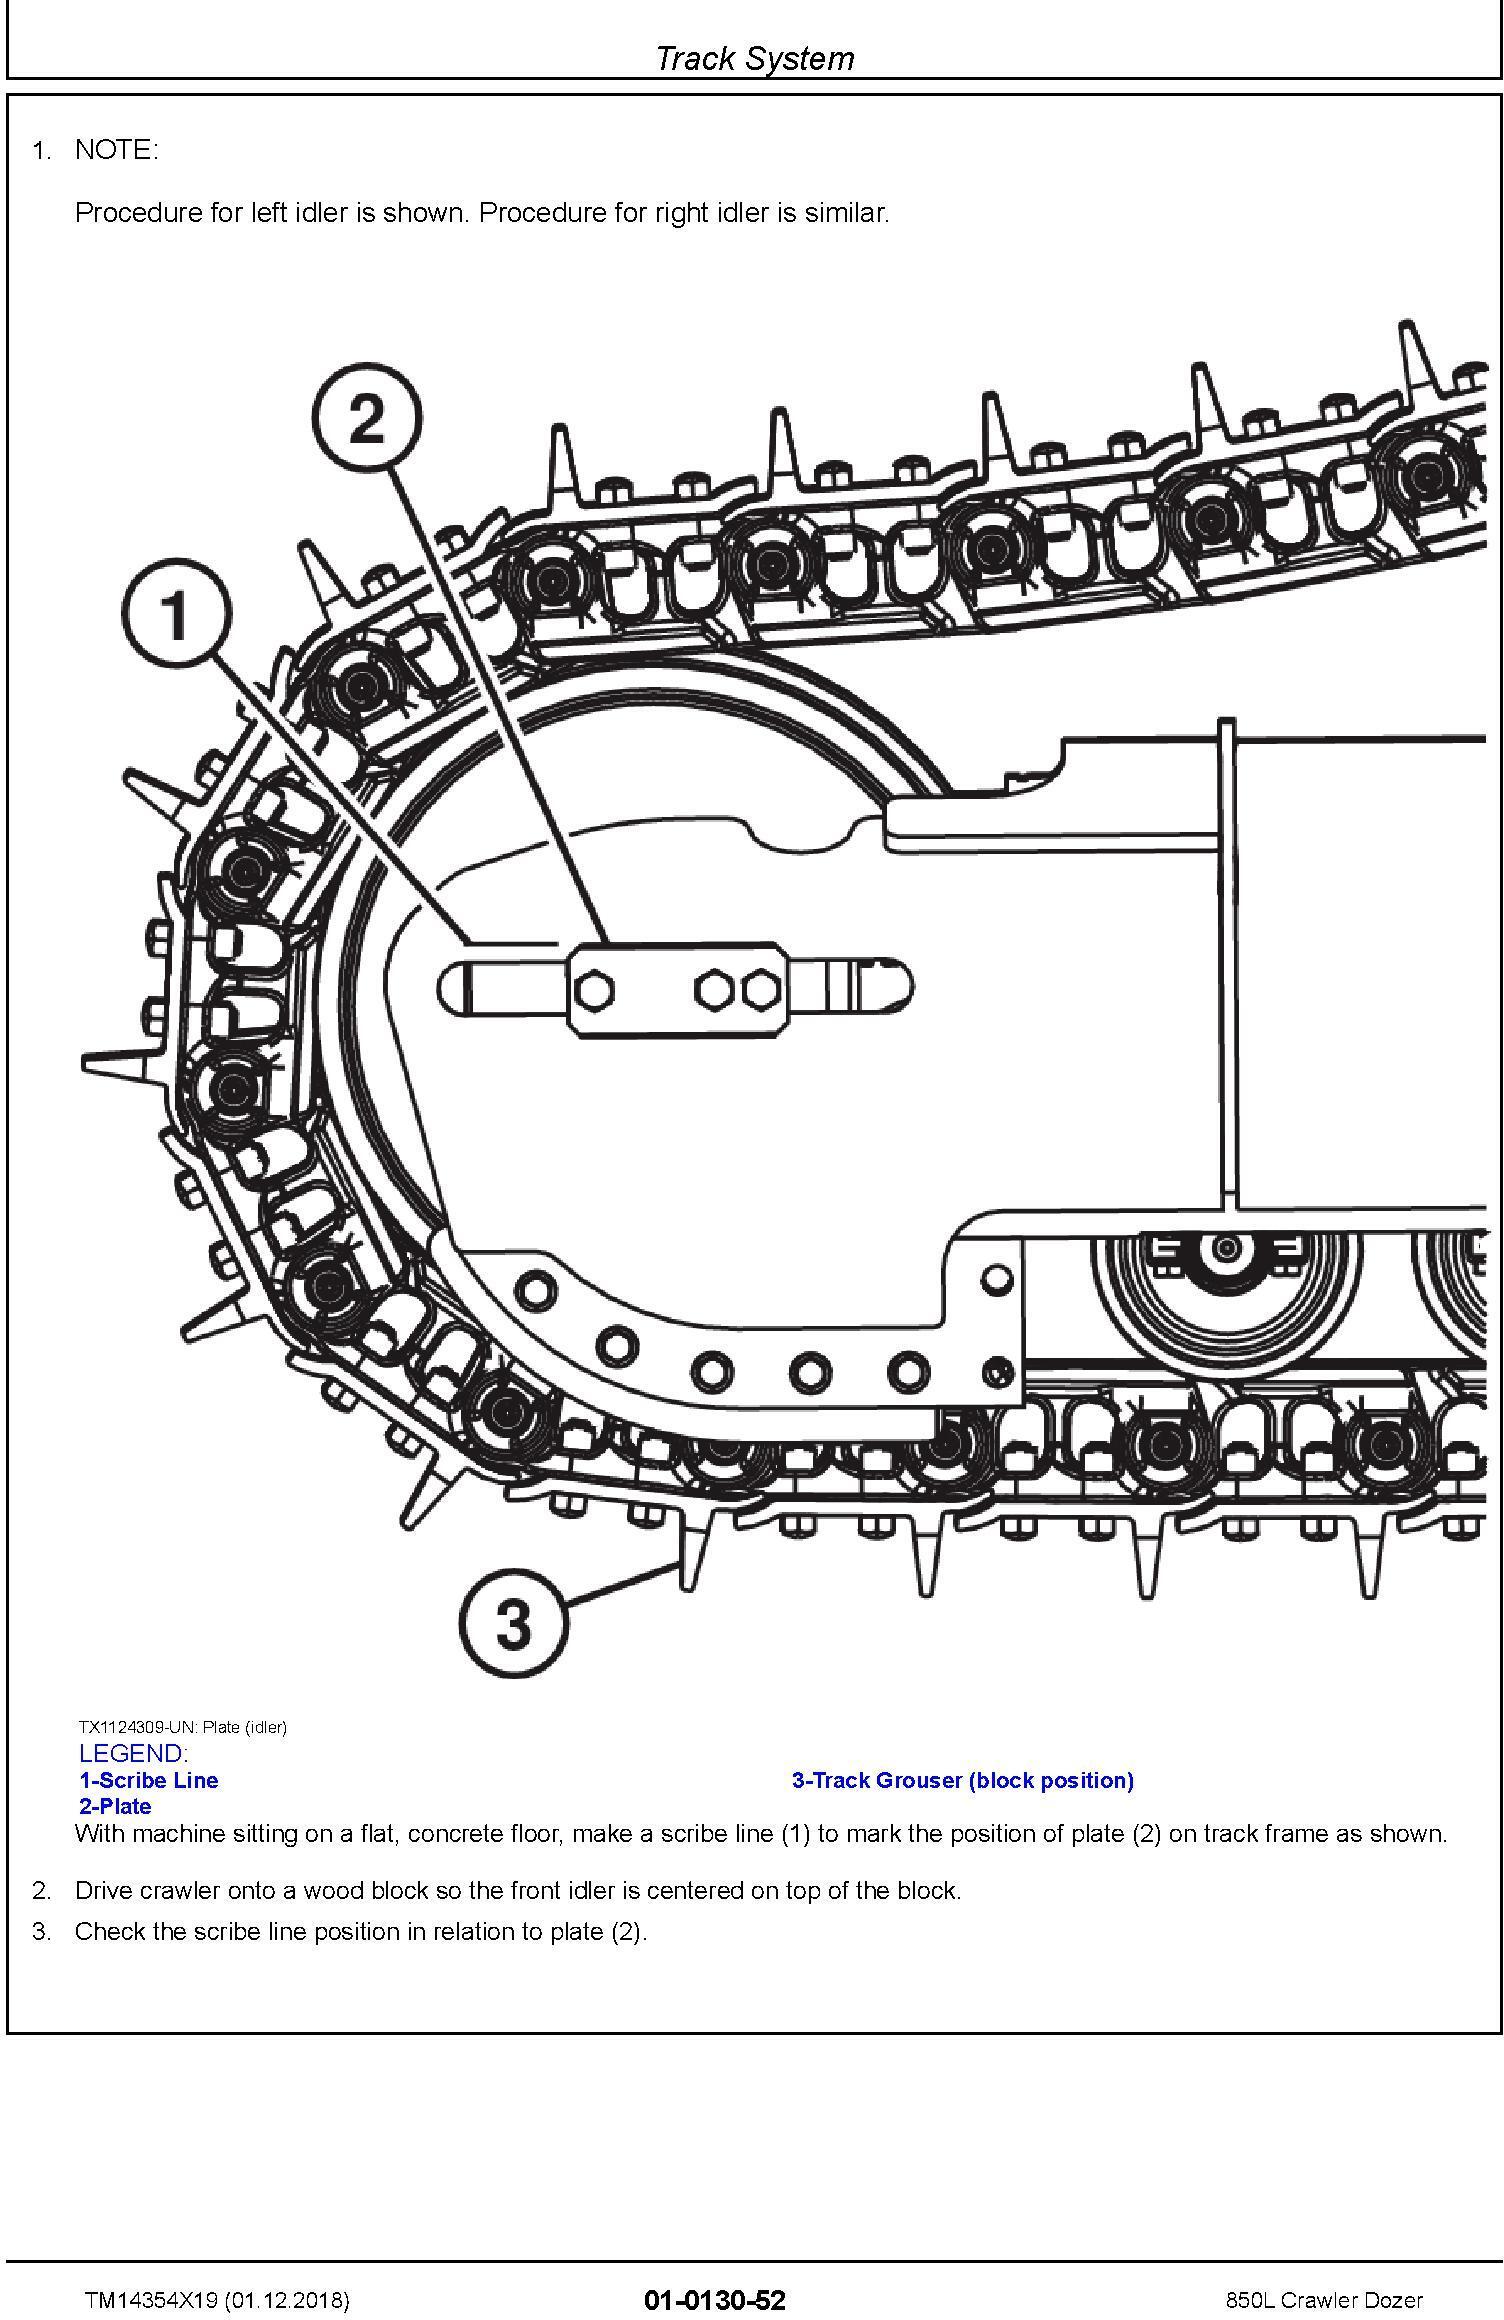 John Deere 850L Crawler Dozer Repair Technical Manual (TM14354X19) - 2